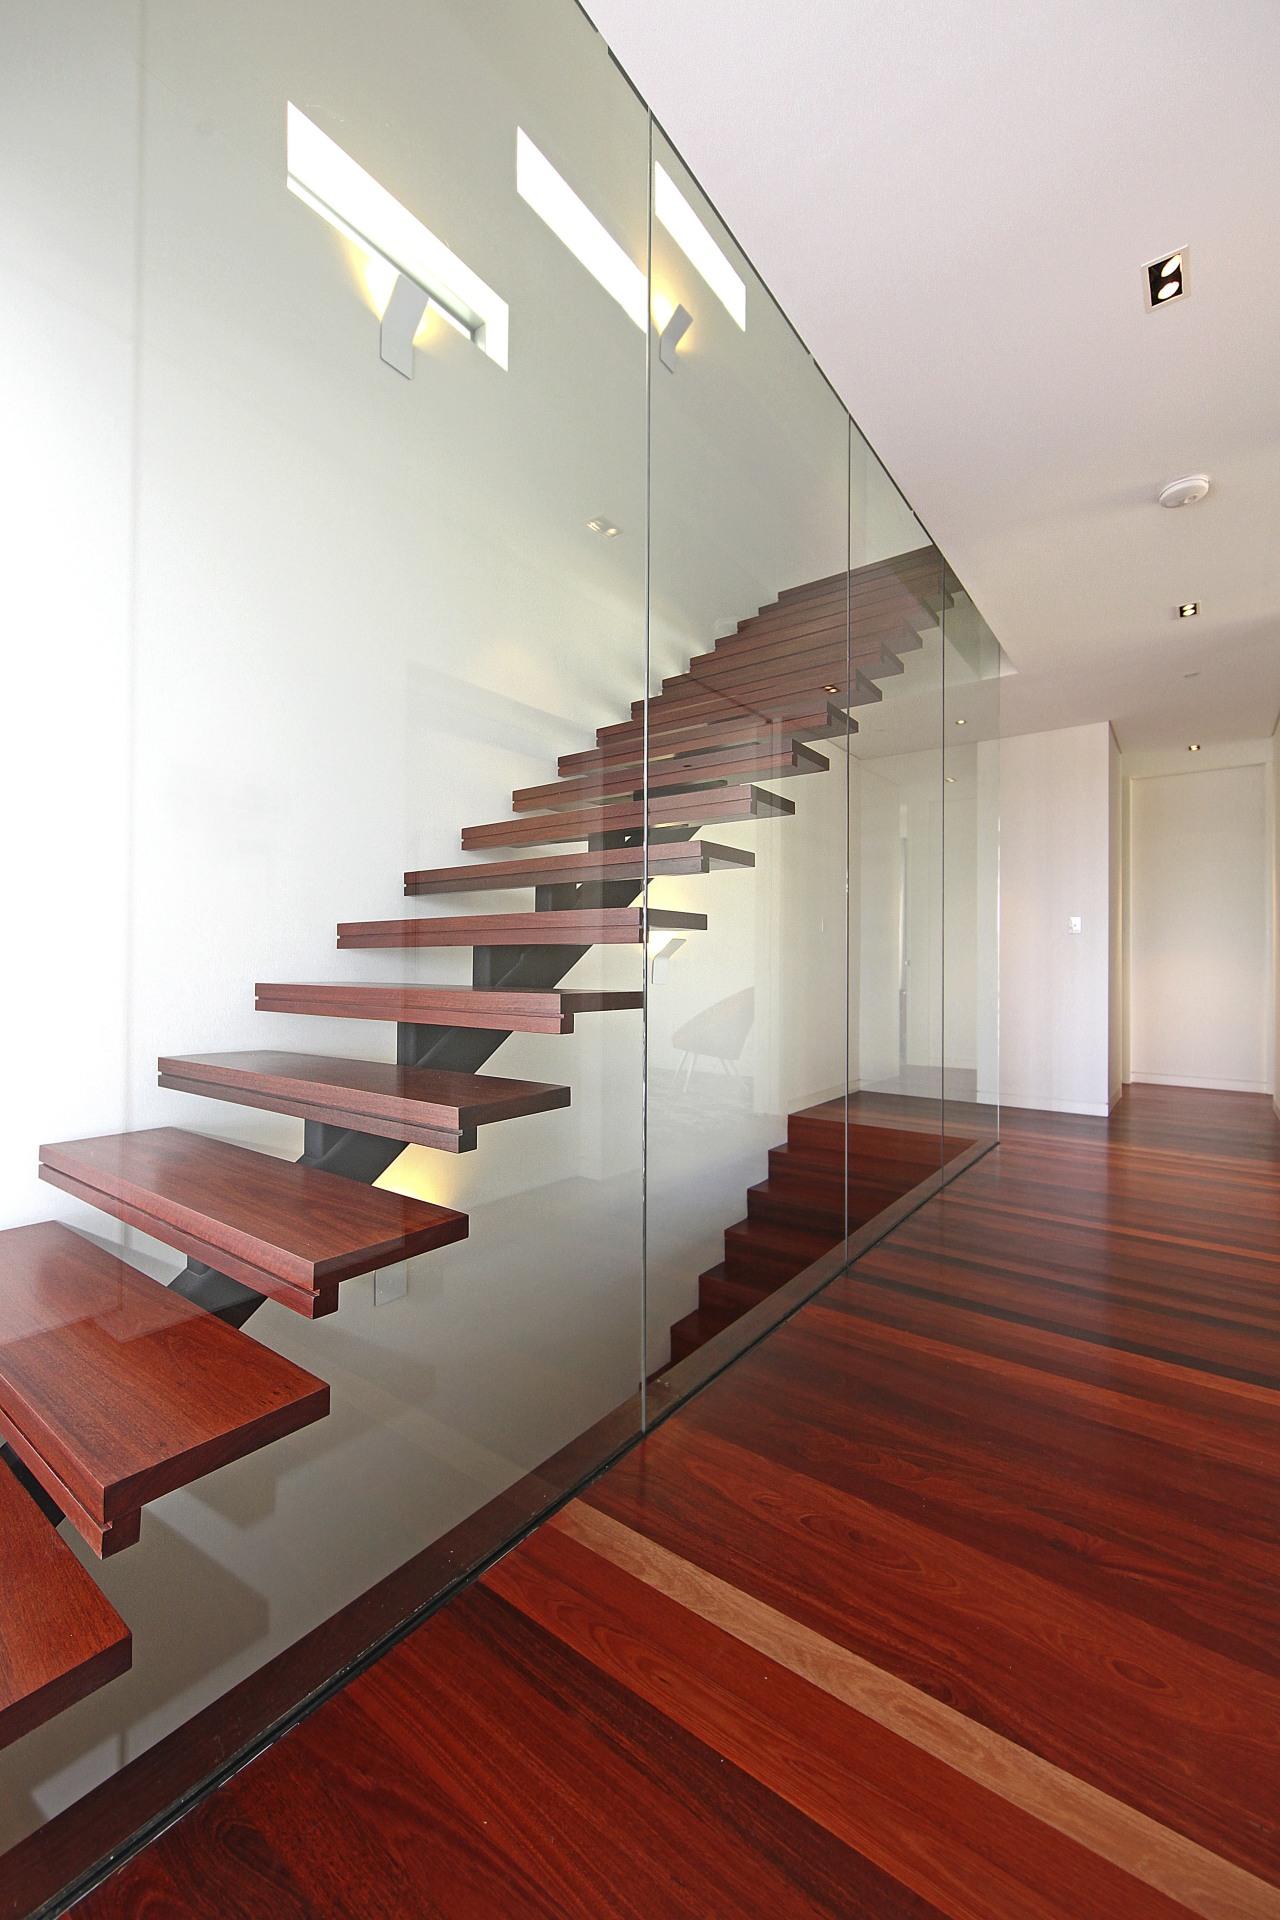 Wooden stairs and flooring. architecture, daylighting, floor, flooring, glass, handrail, hardwood, interior design, laminate flooring, stairs, wall, wood, wood flooring, white, red